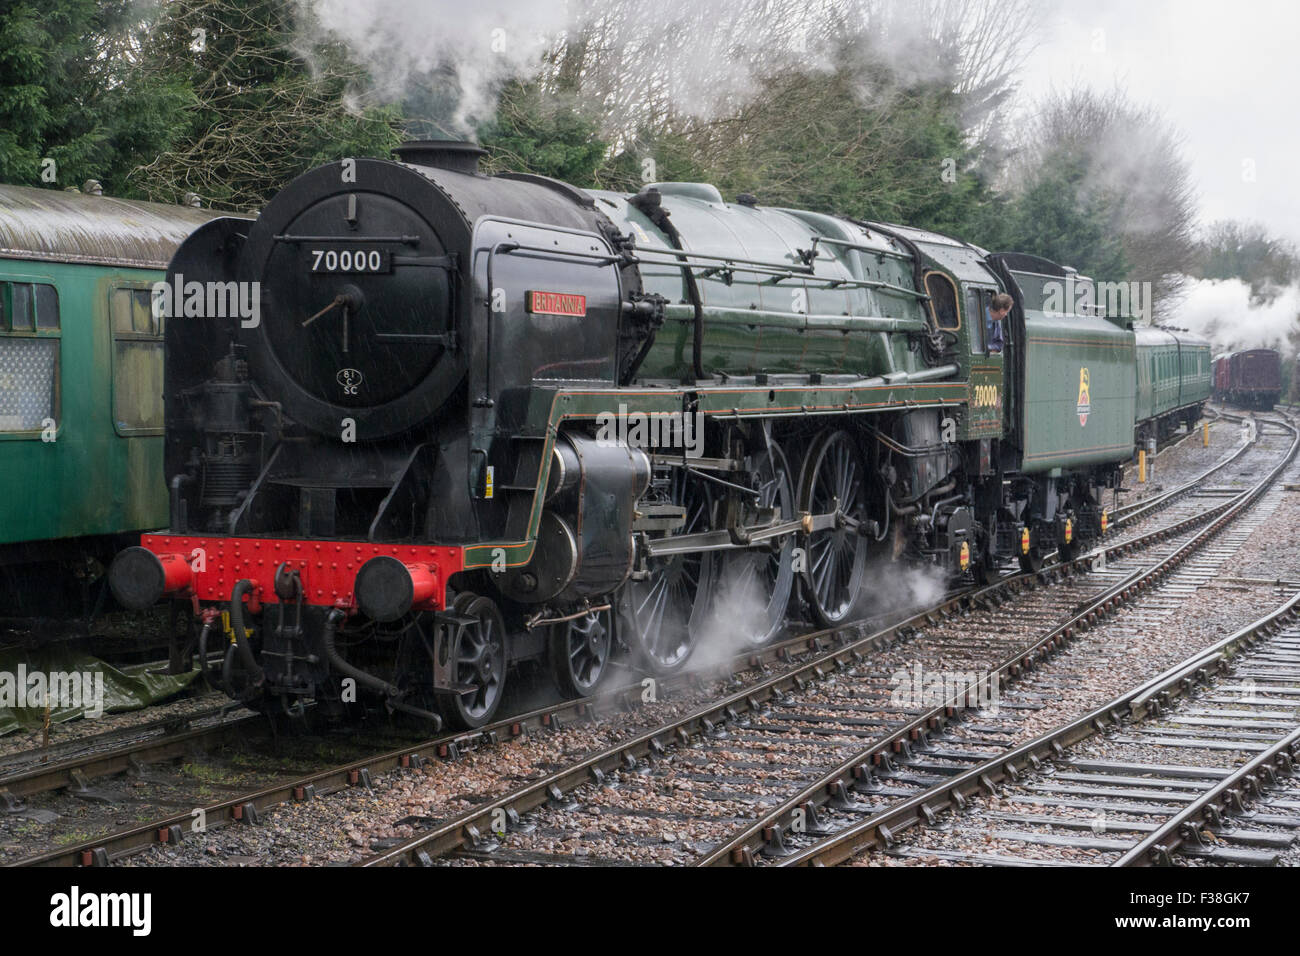 BR Standard Class 7 Steam Locomotive number 70000